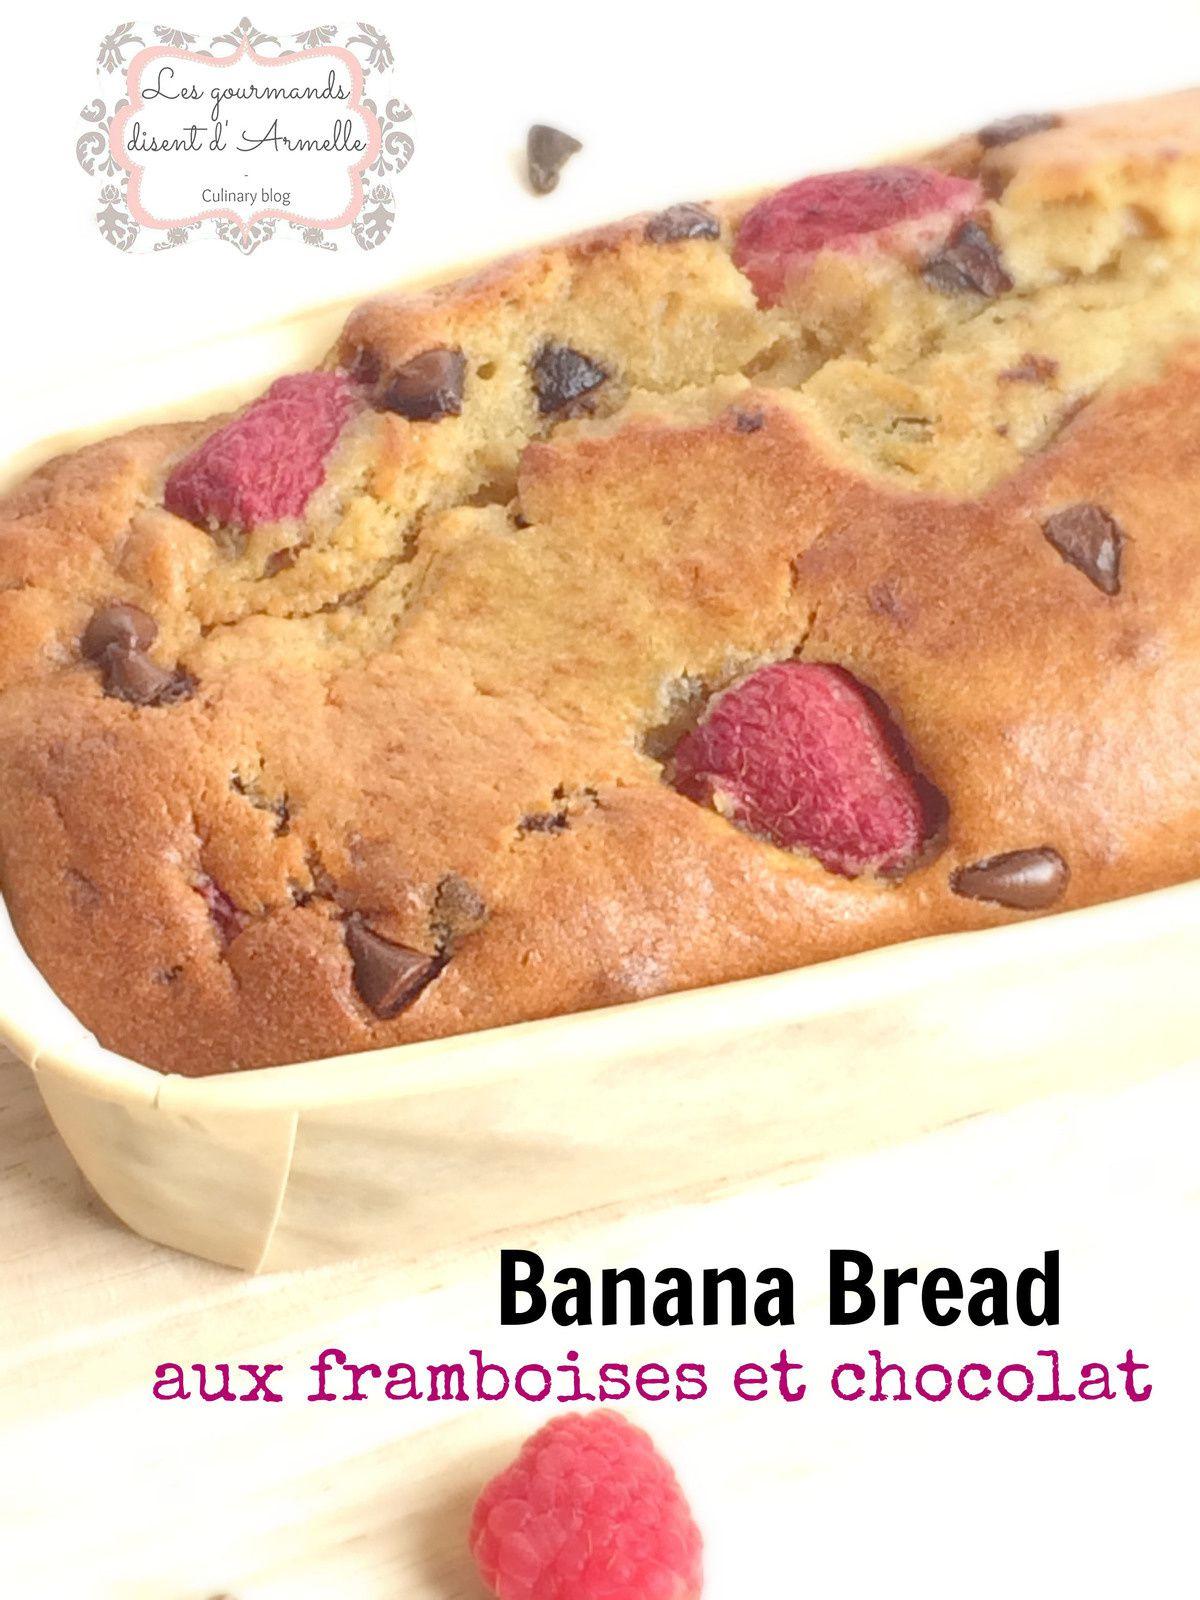 Banana bread aux framboises et chocolat